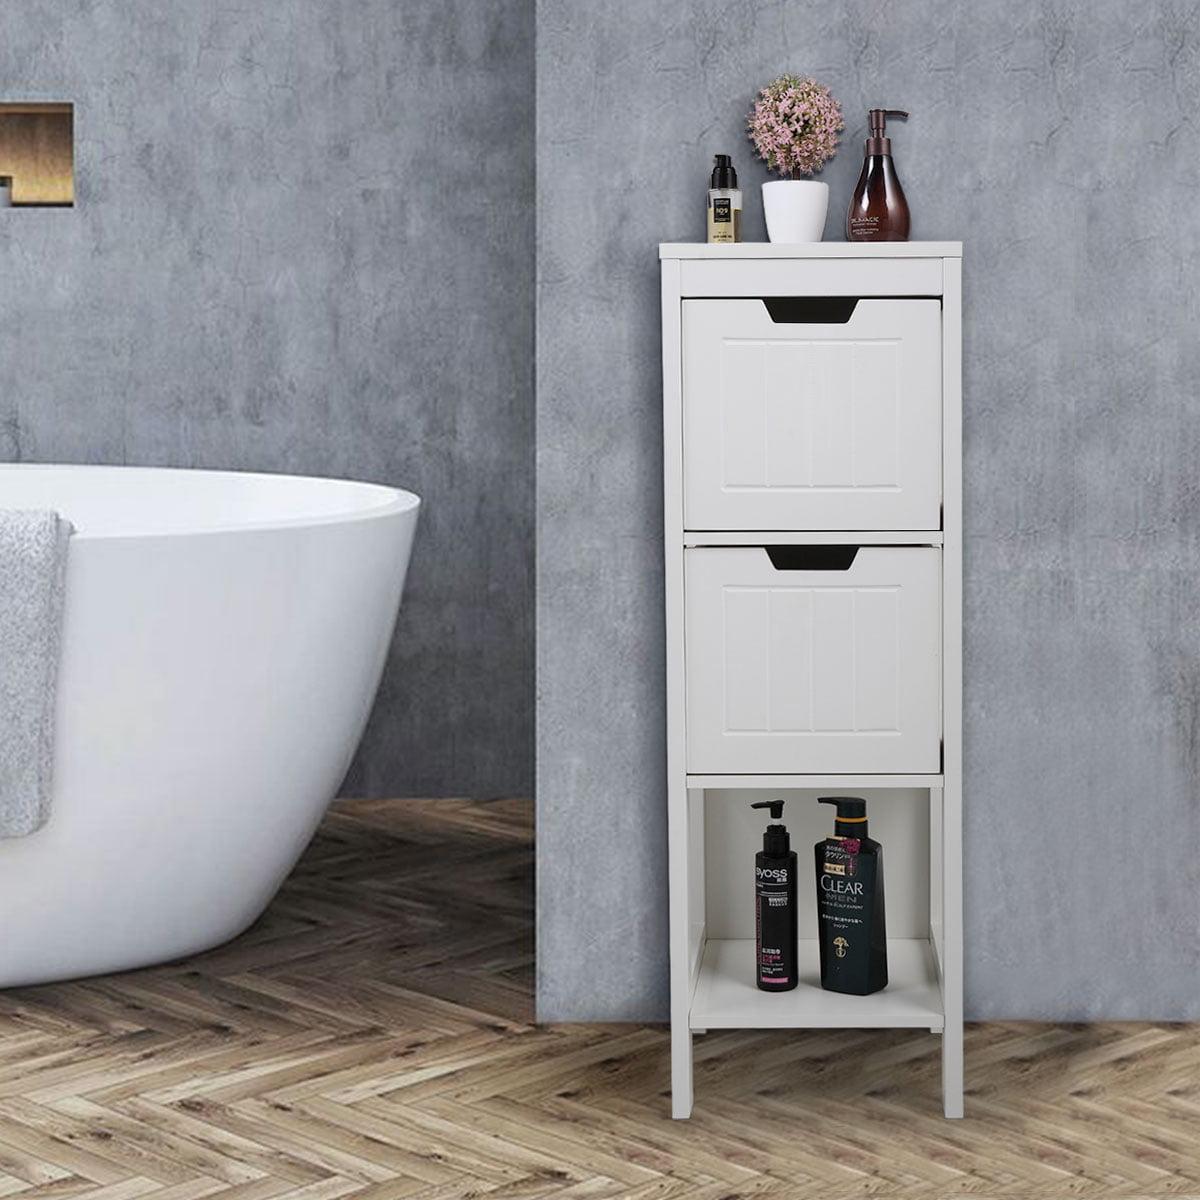 Veryke Bathroom Storage Cabinets, Floor Bathroom Cabinets ...